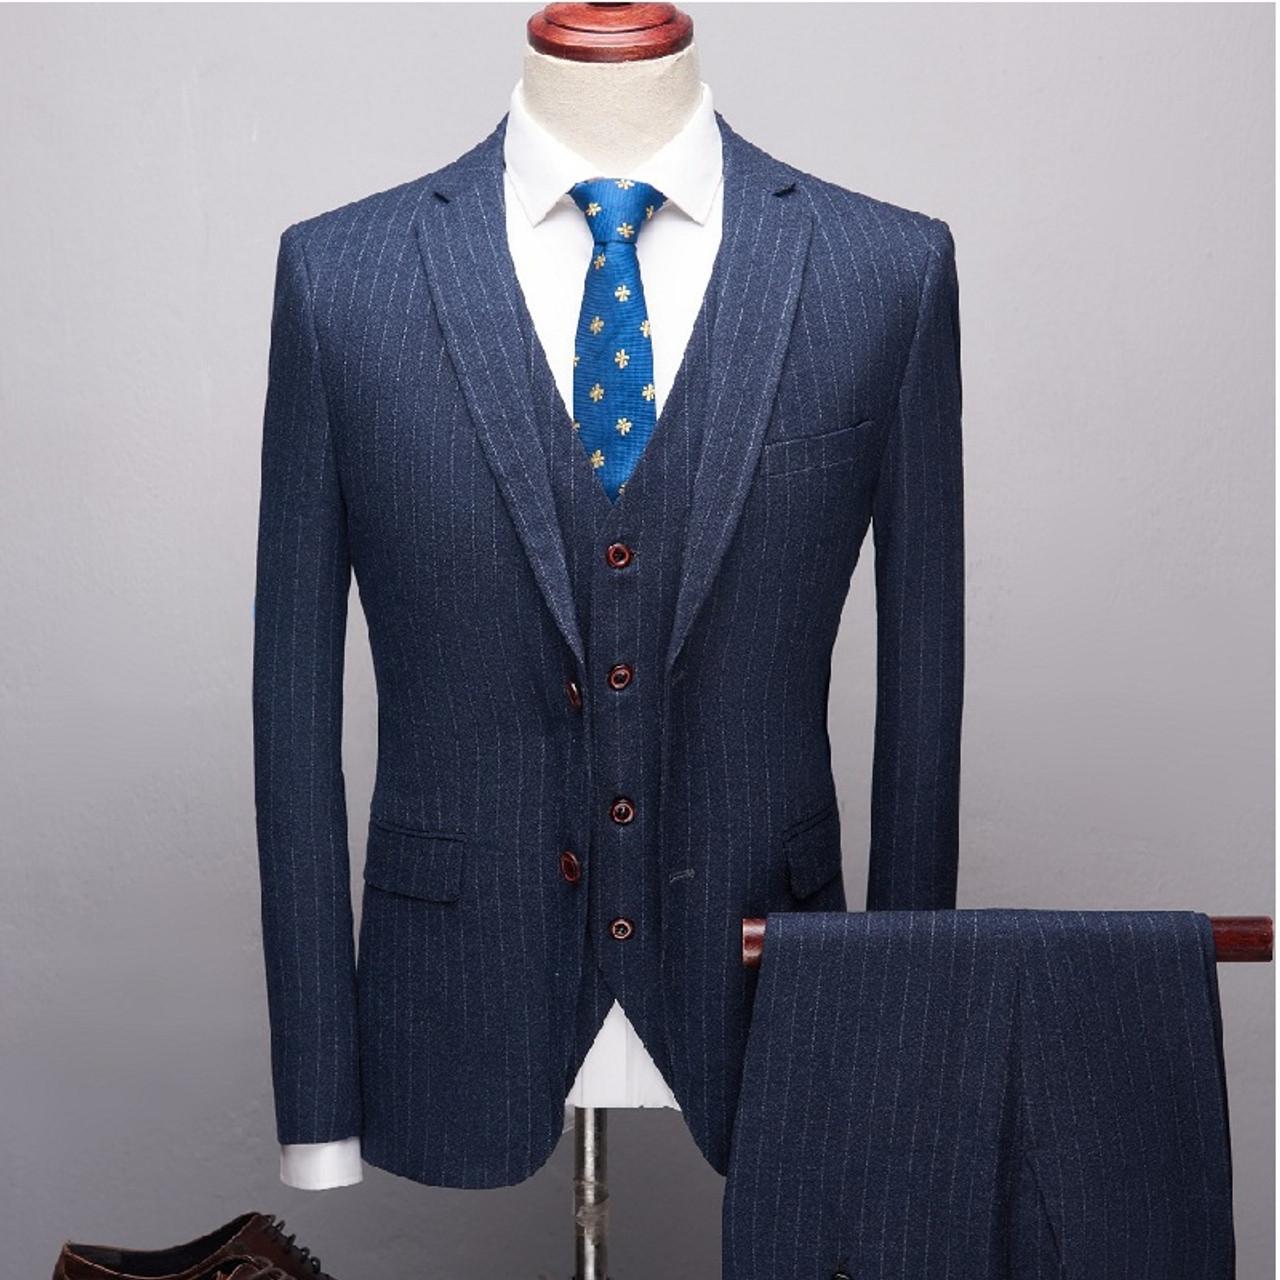 Designers 2019 Black Red Tuxedo Men S Suits Formal Grooms Wedding Prom Blazer Mens 3 Piece Korean Business Suit Slim Fit Onshopdeals Com